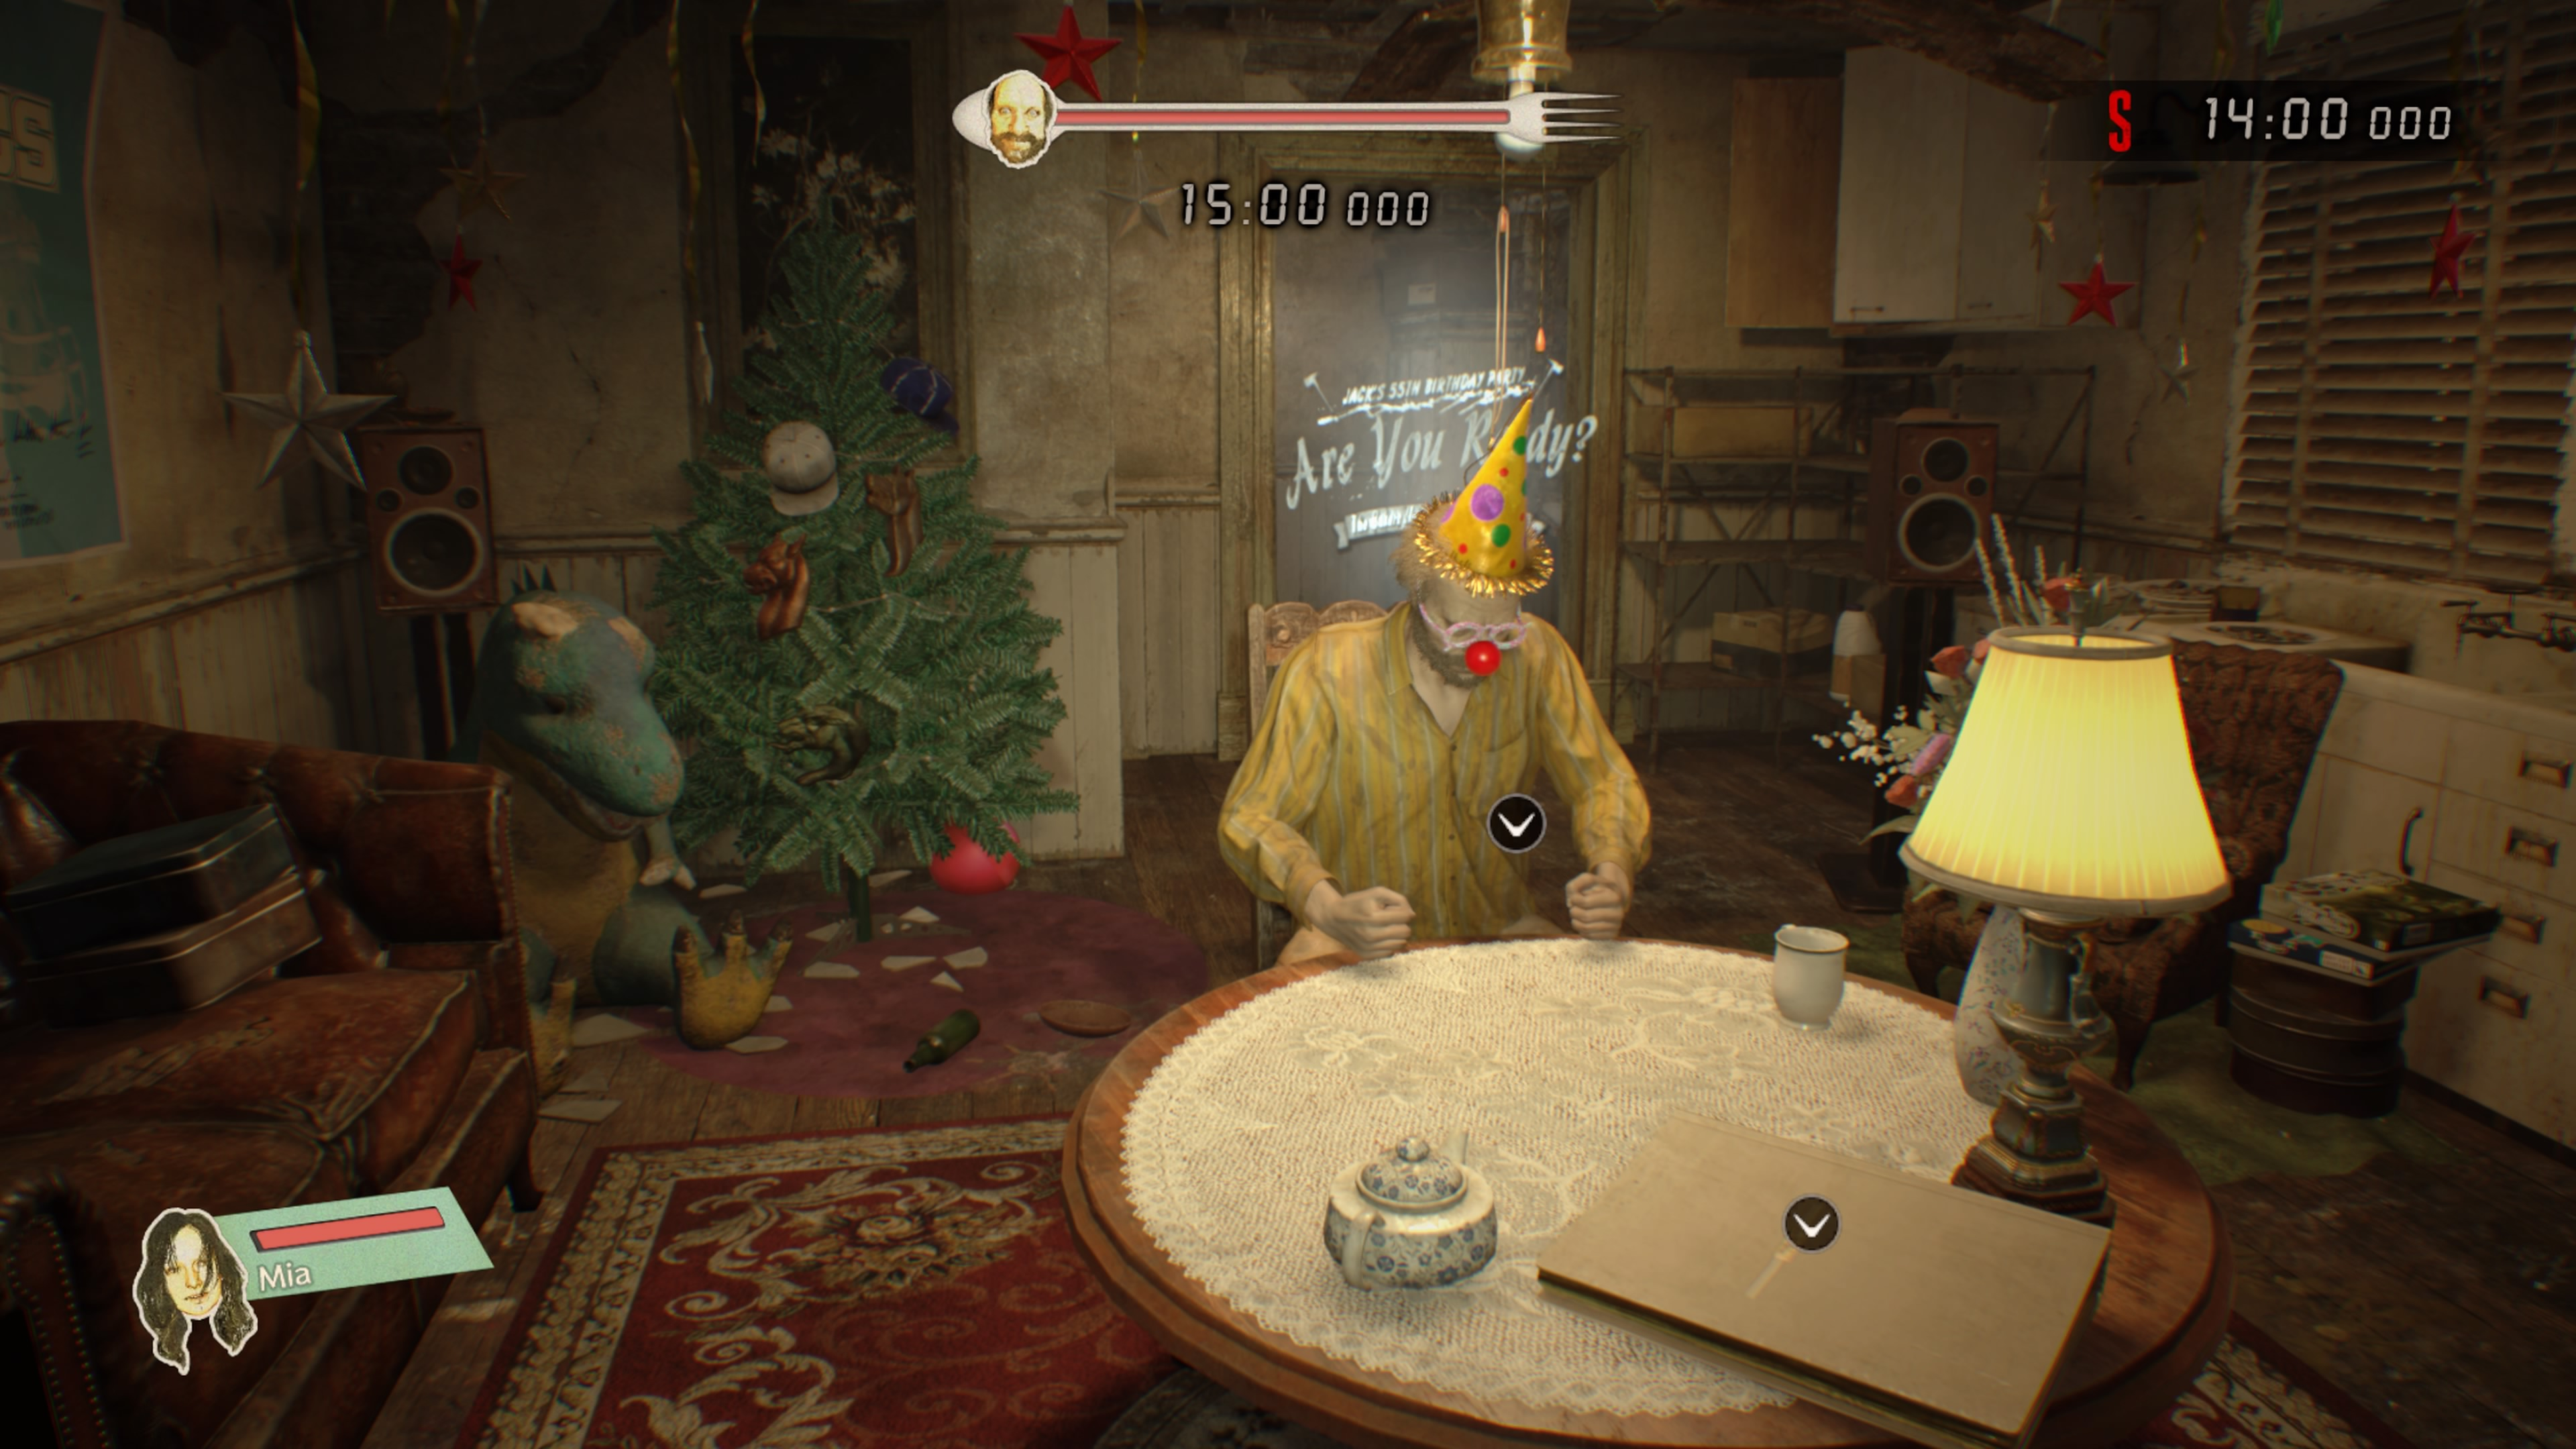 Resident Evil 7: Biohazard - druhé DLC pod drobnohledem 138840